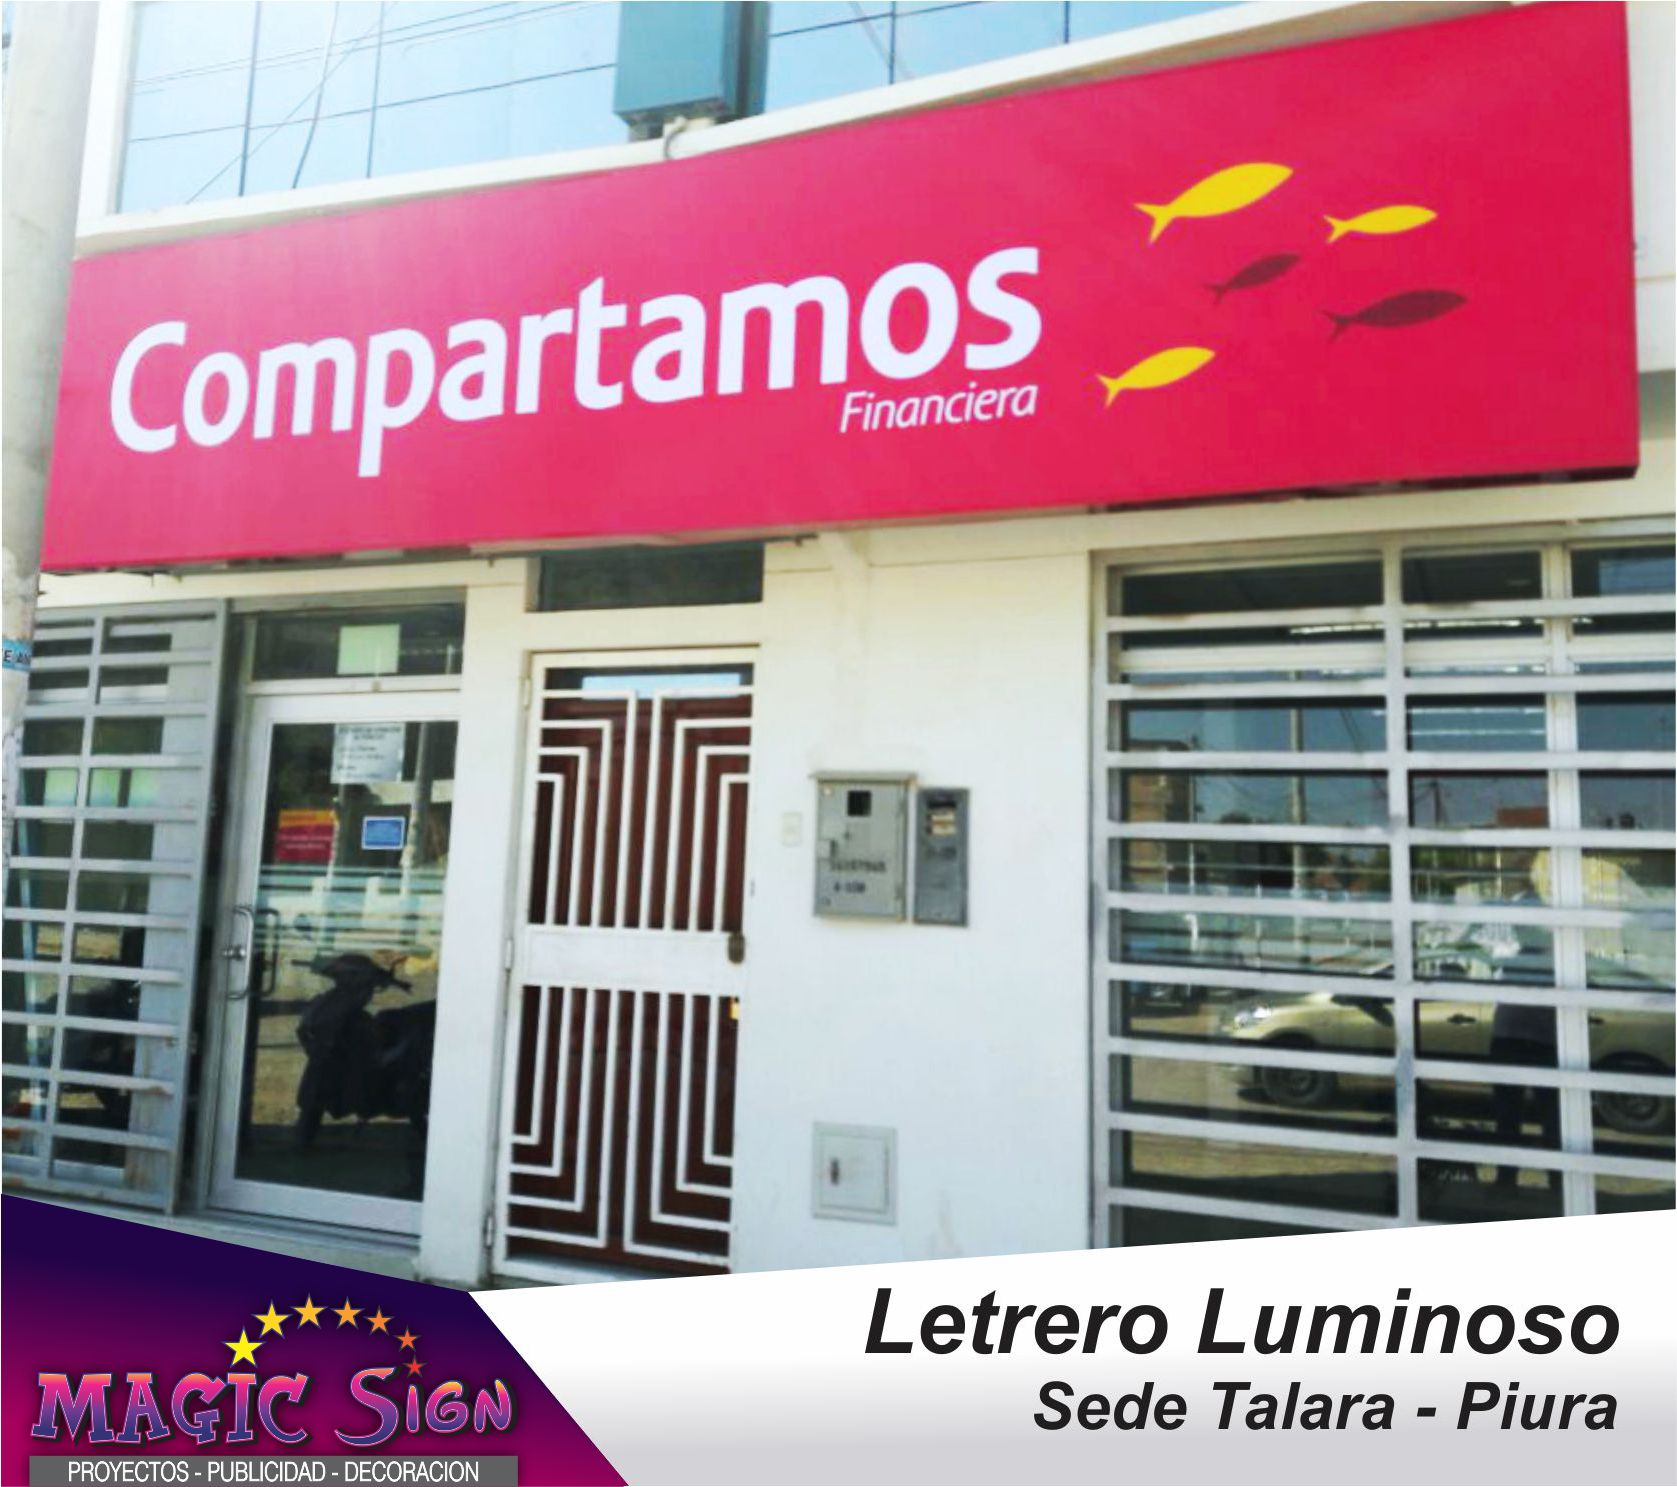 Letrero Luminoso Peru